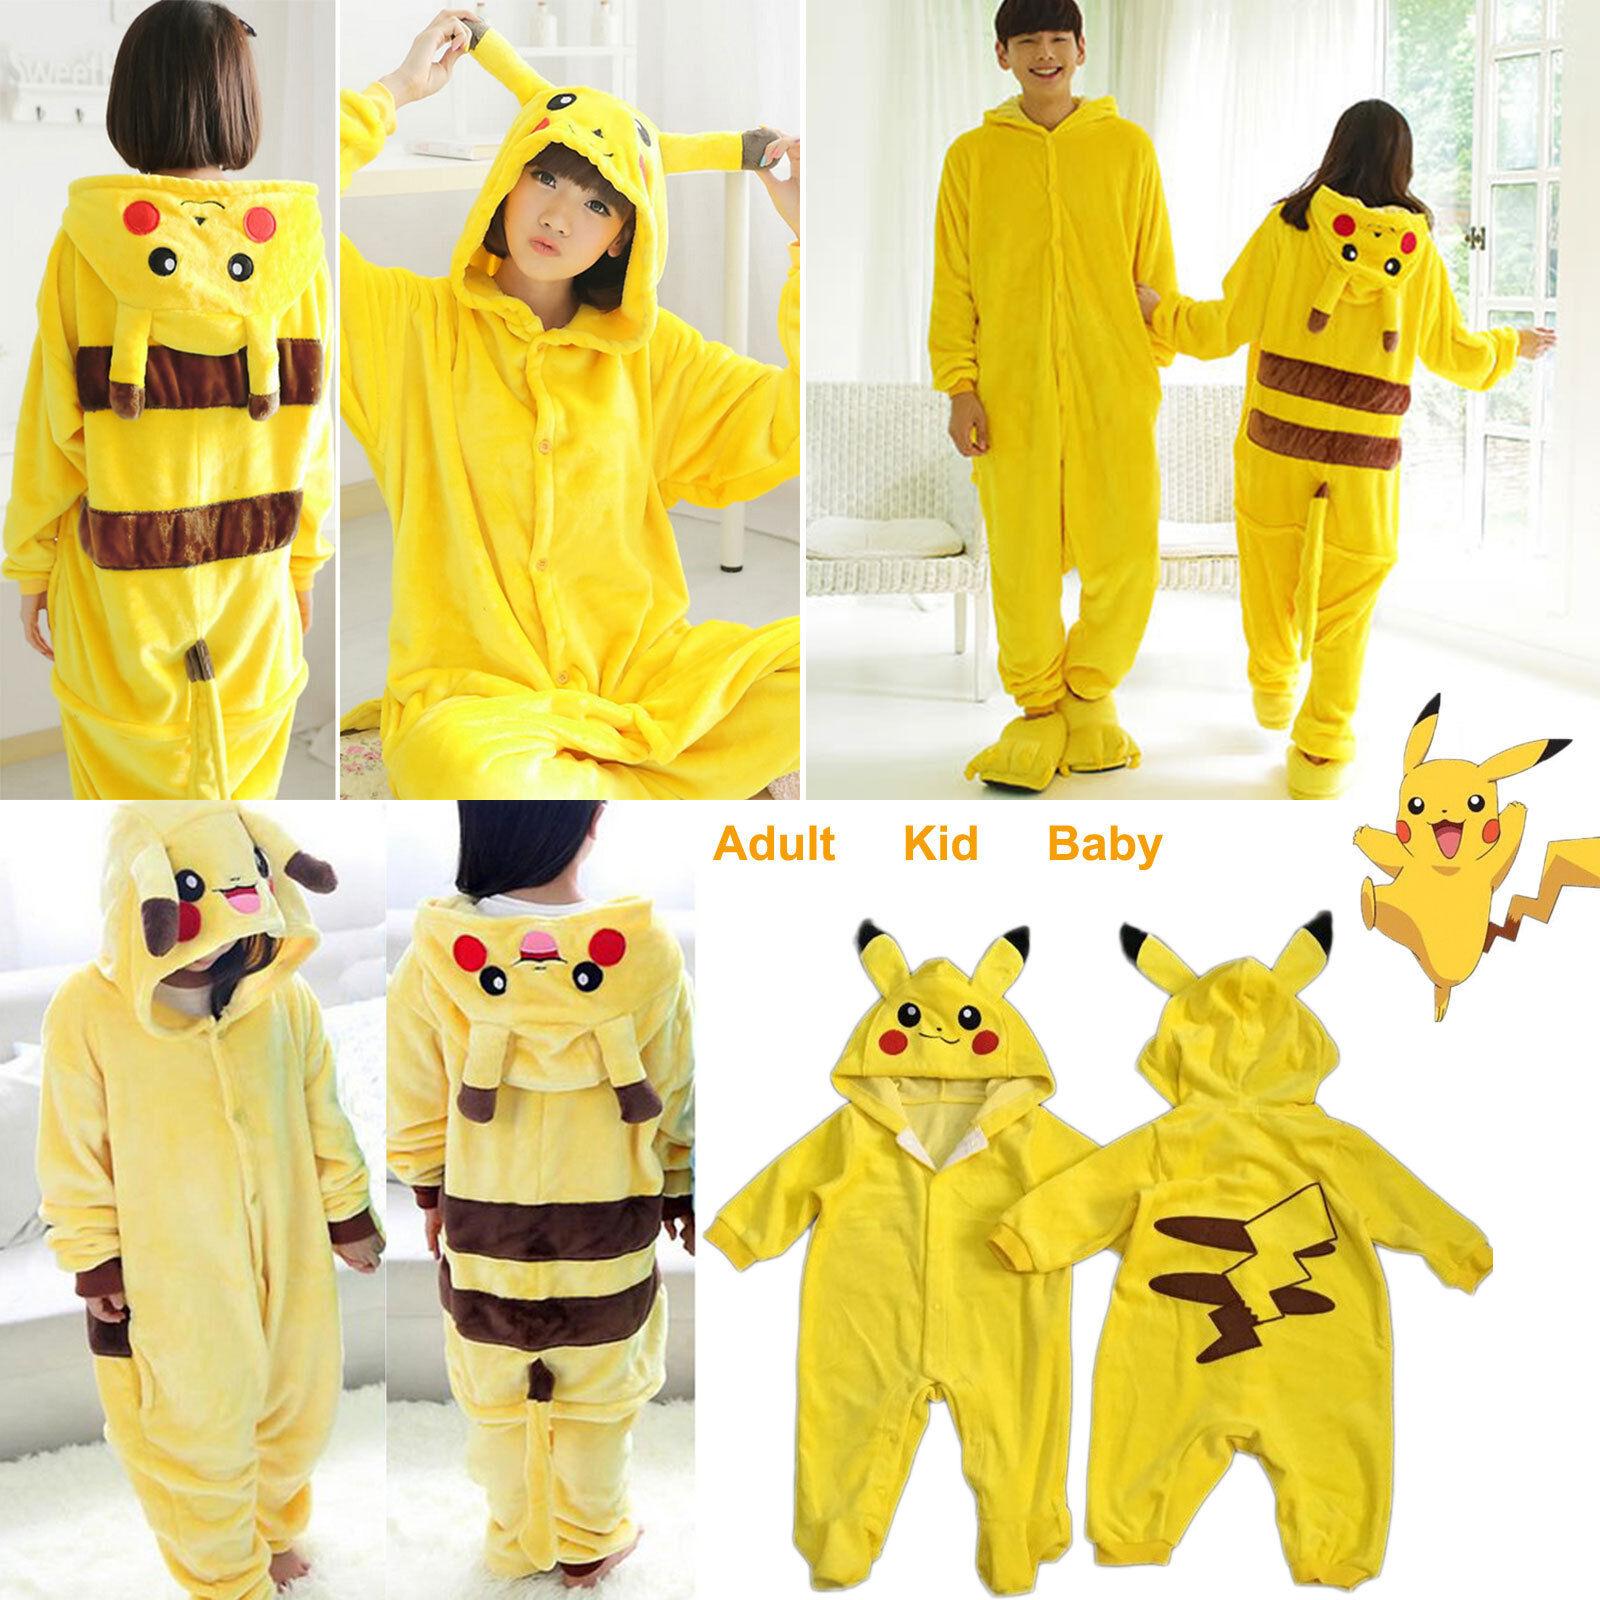 Lovely Pokemon Pikachu Kigurumi Pajamas Cosplay Costume Onesis Sleepwear For Adult Kid Baby